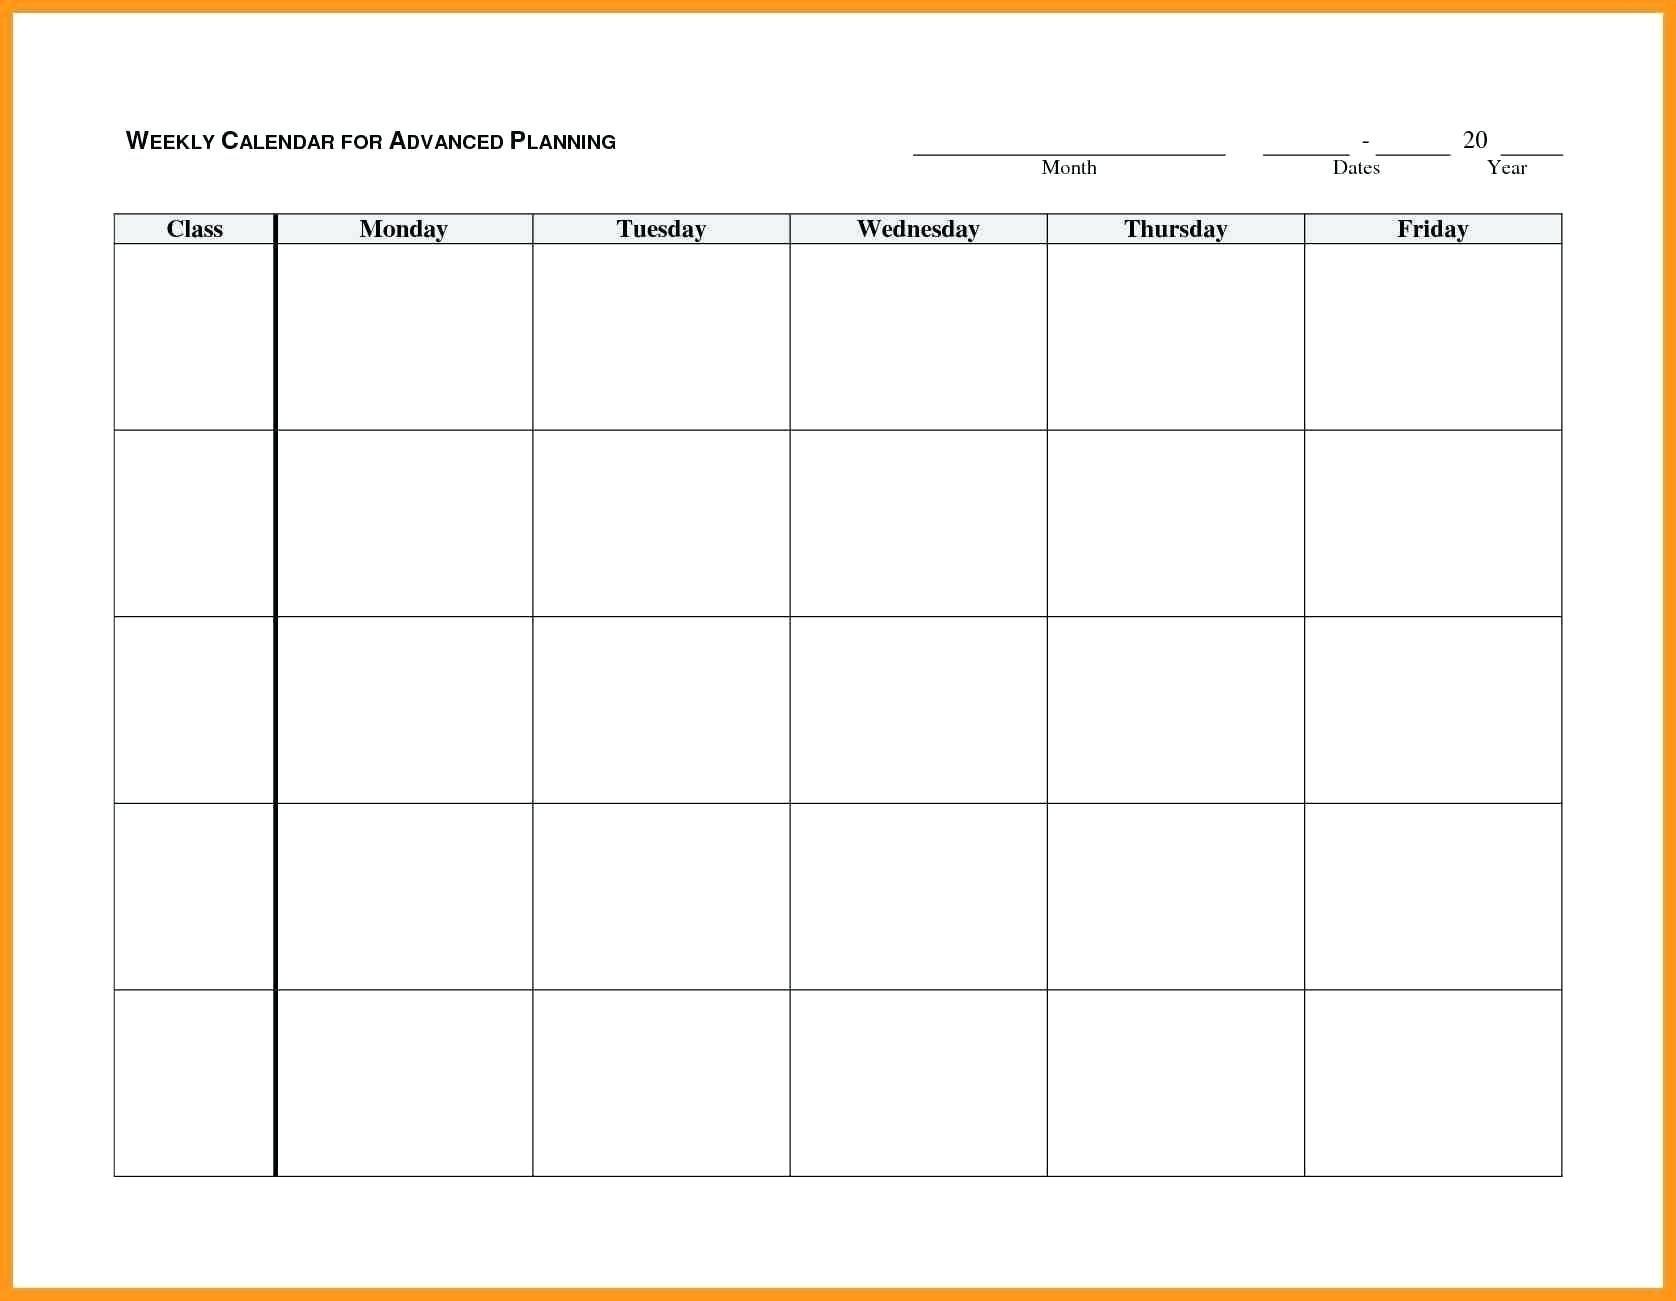 Blank Monday Through Friday Month Calendar Template : Free Monday To Friday Calender Template